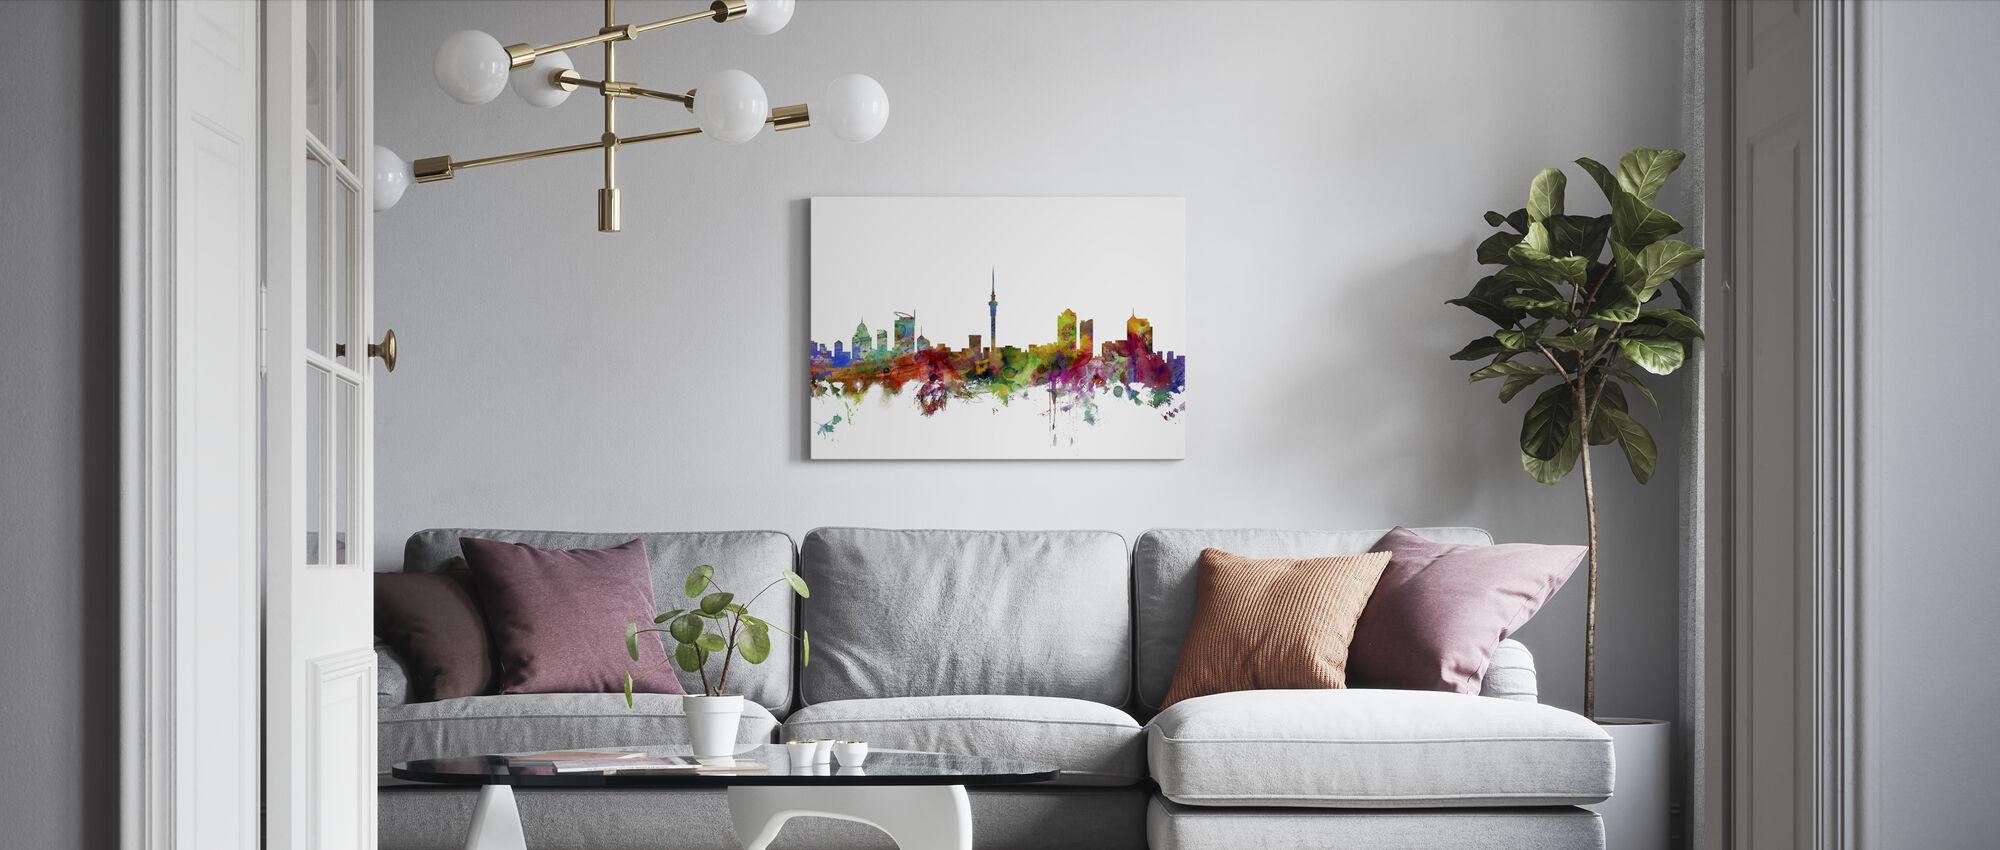 Auckland Skyline - Canvas print - Living Room